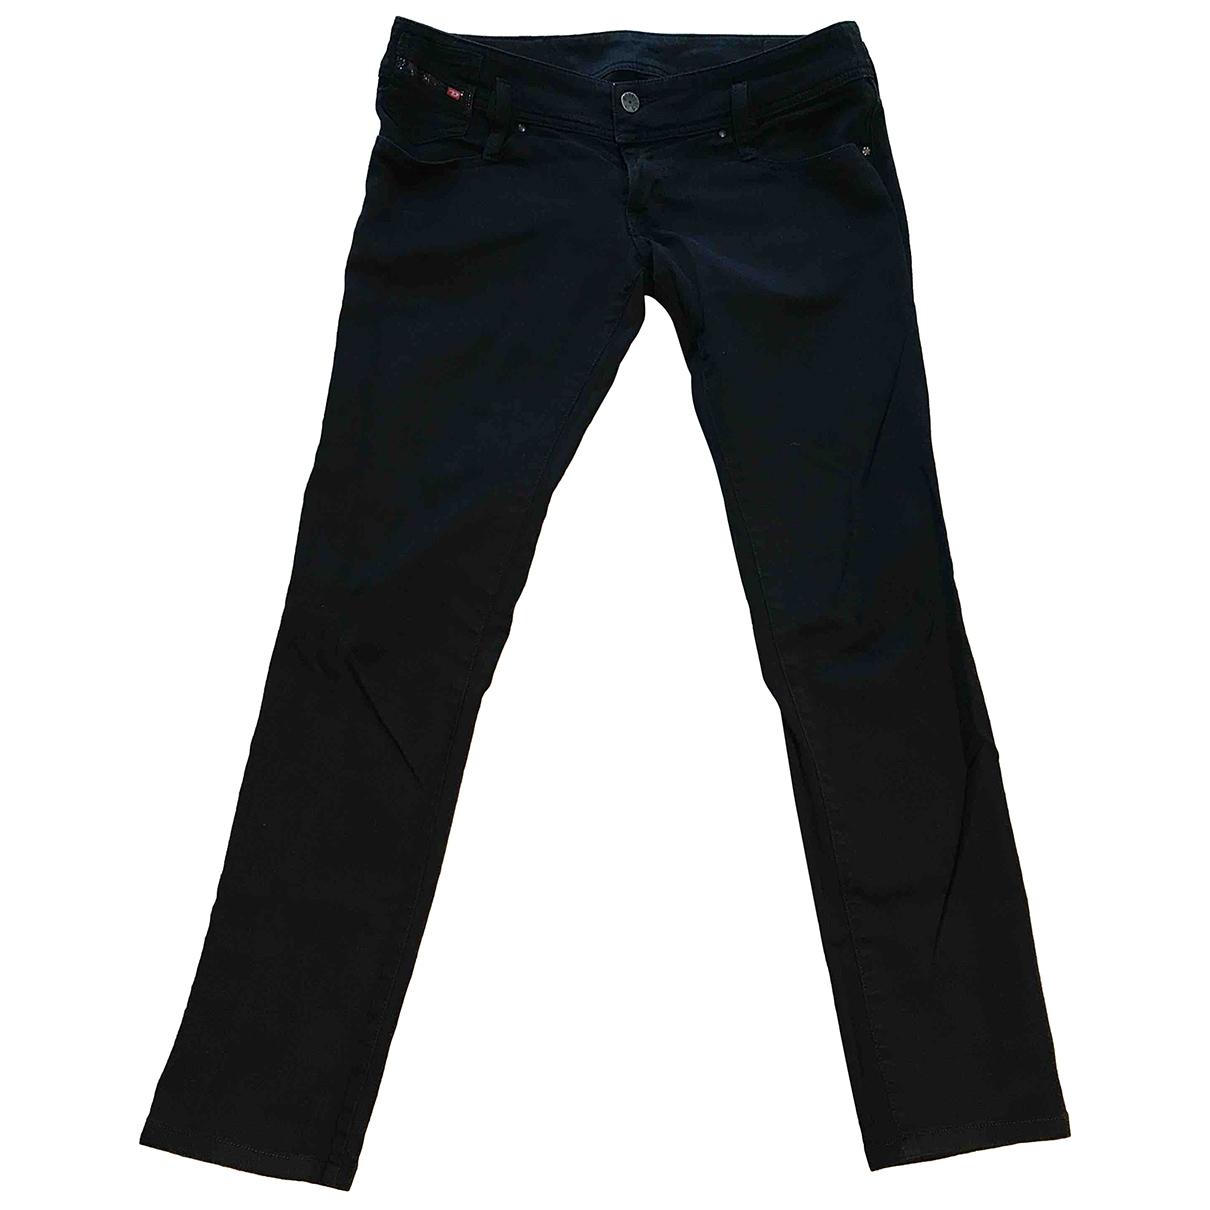 Diesel \N Black Denim - Jeans Jeans for Women 28 US